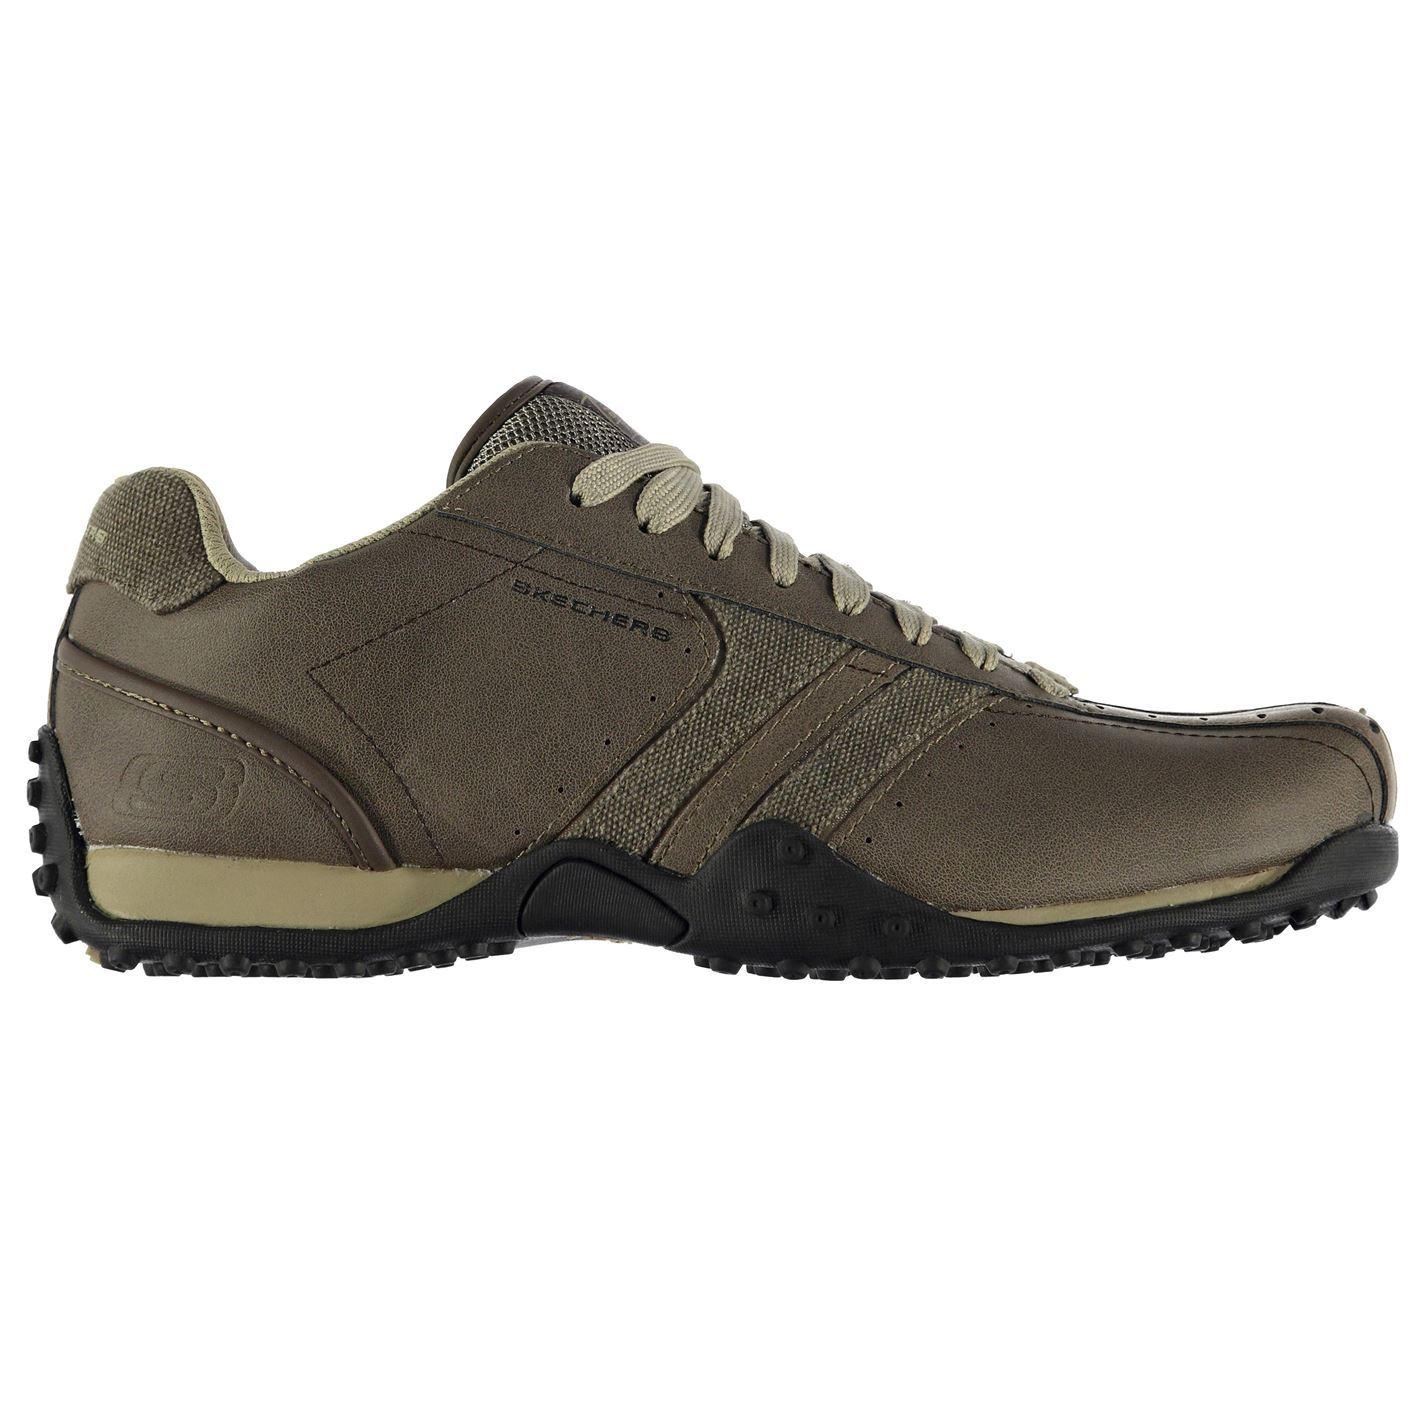 Skechers-Urban-Track-Forward-Trainers-Mens-Athleisure-Footwear-Shoes-Sneakers thumbnail 16